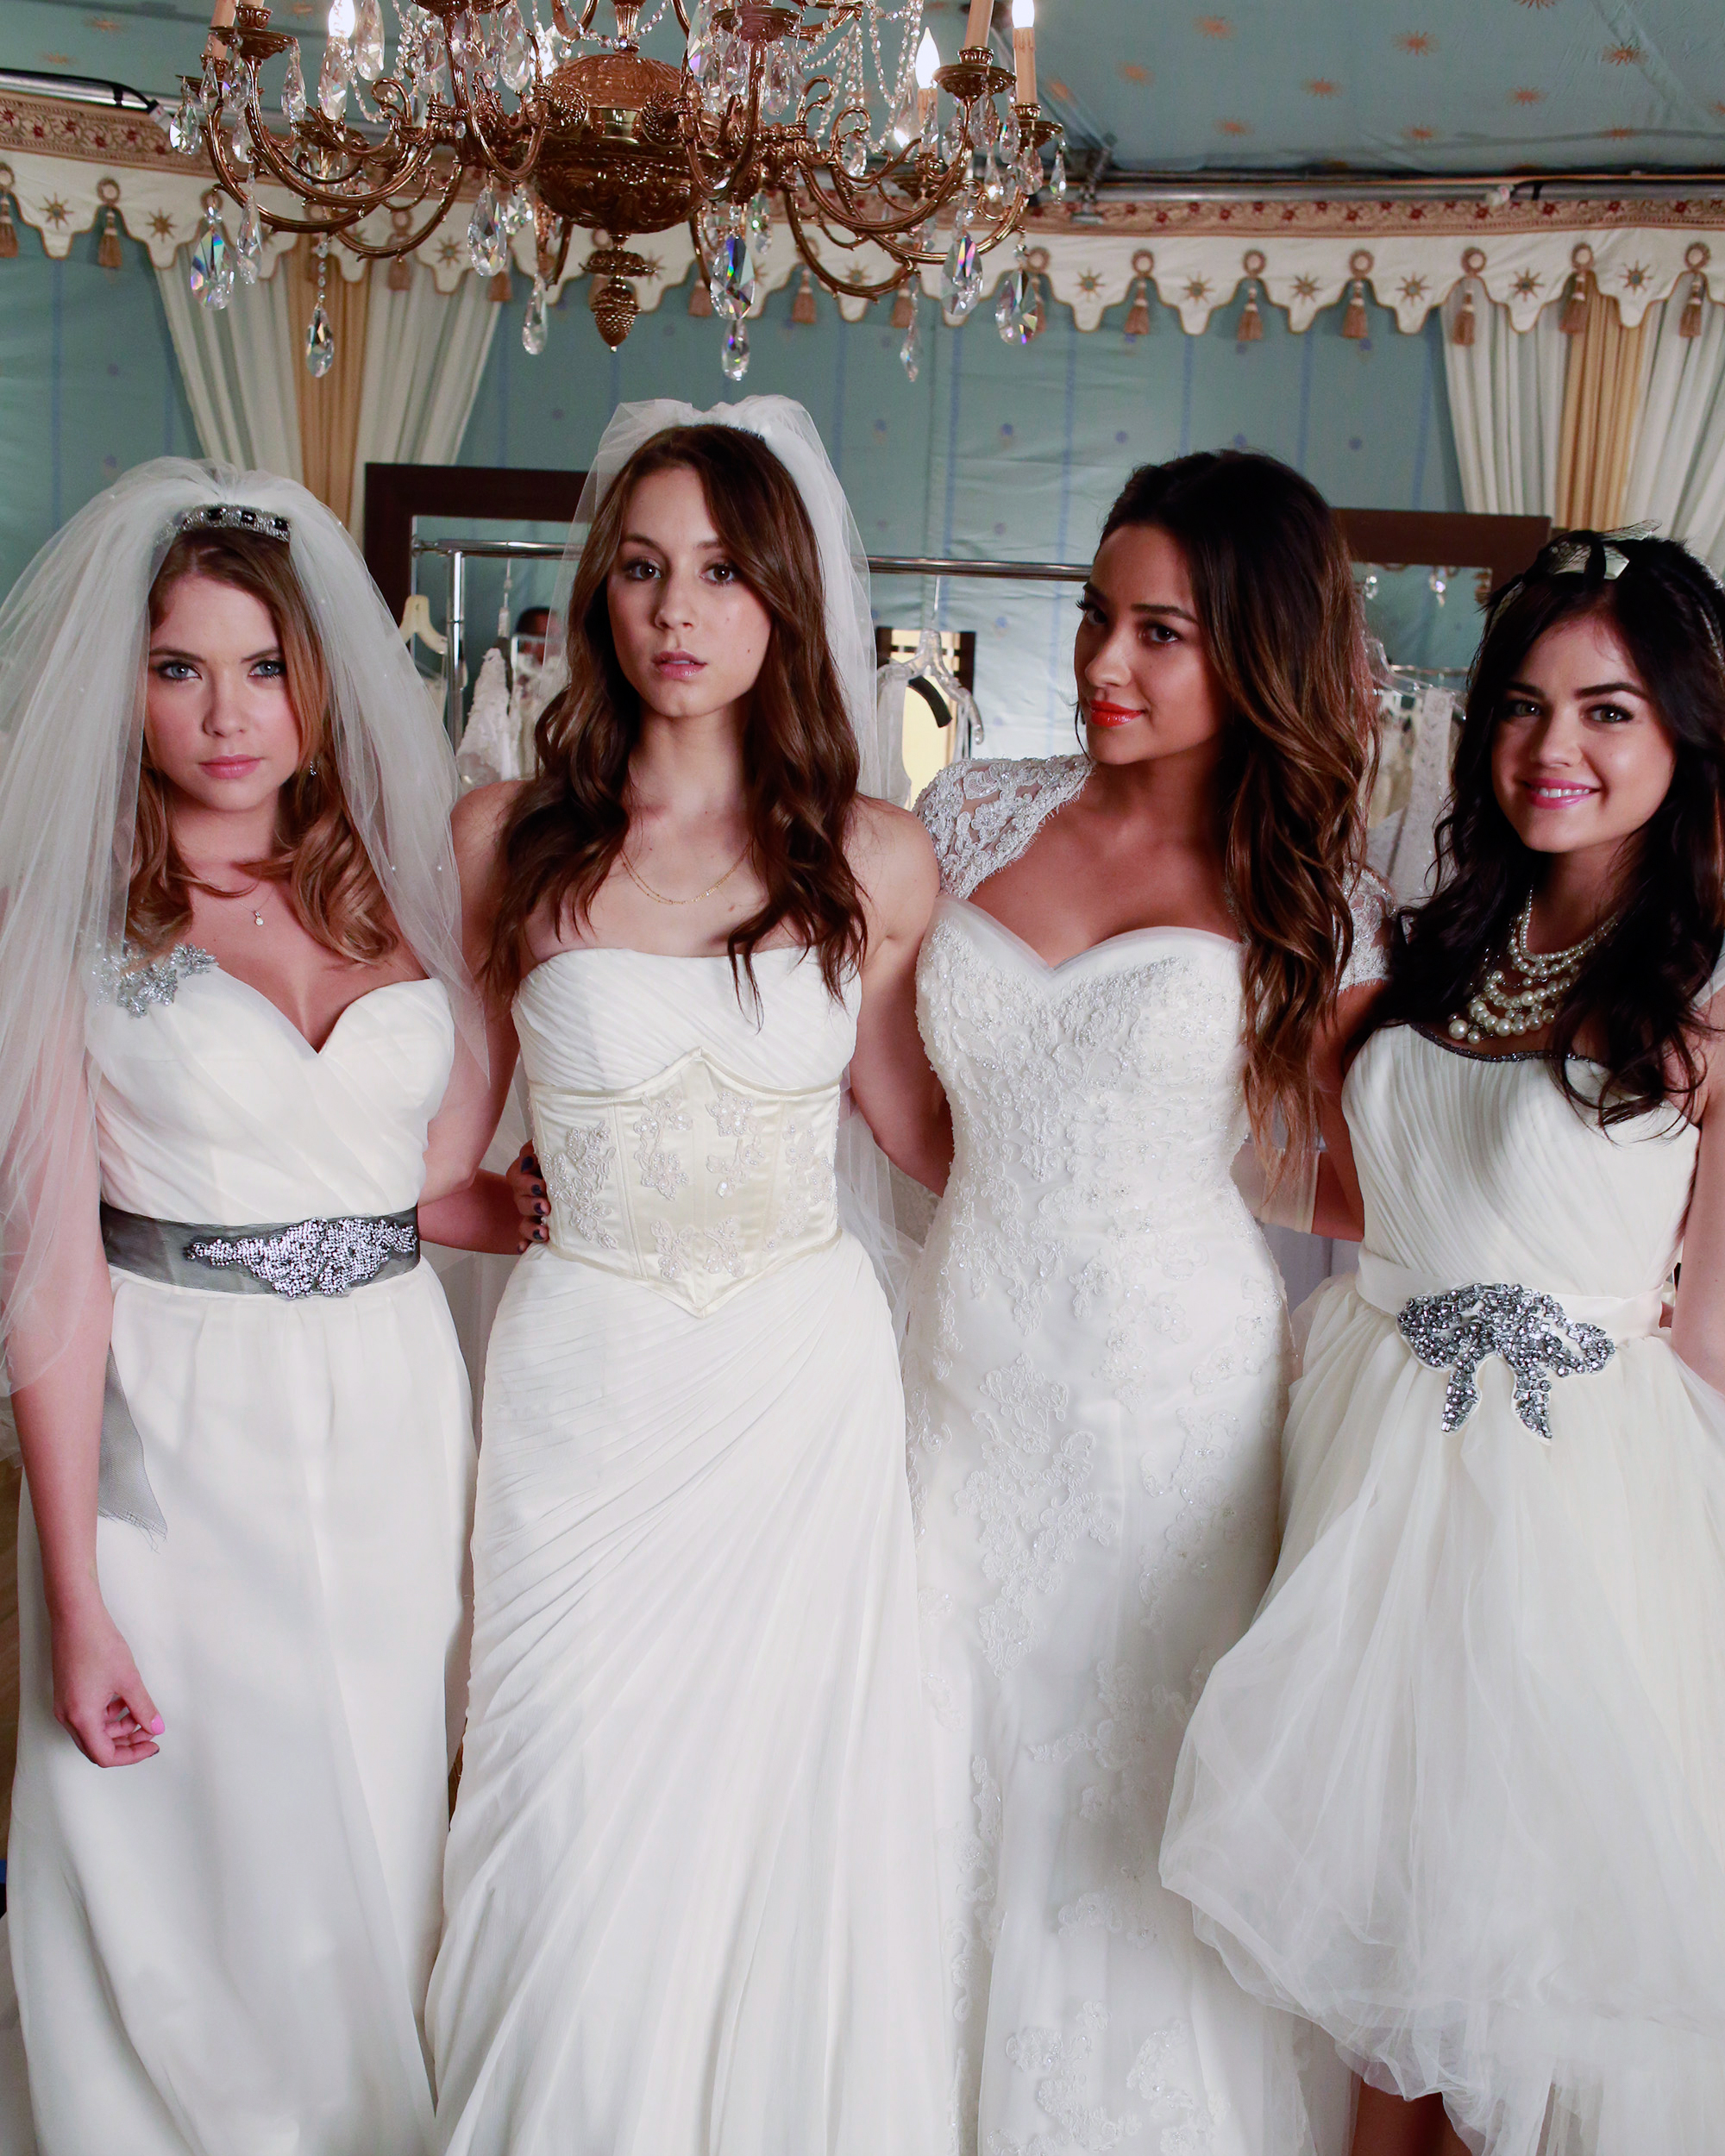 tv-wedding-dresses-pretty-little-liars-1115.jpg